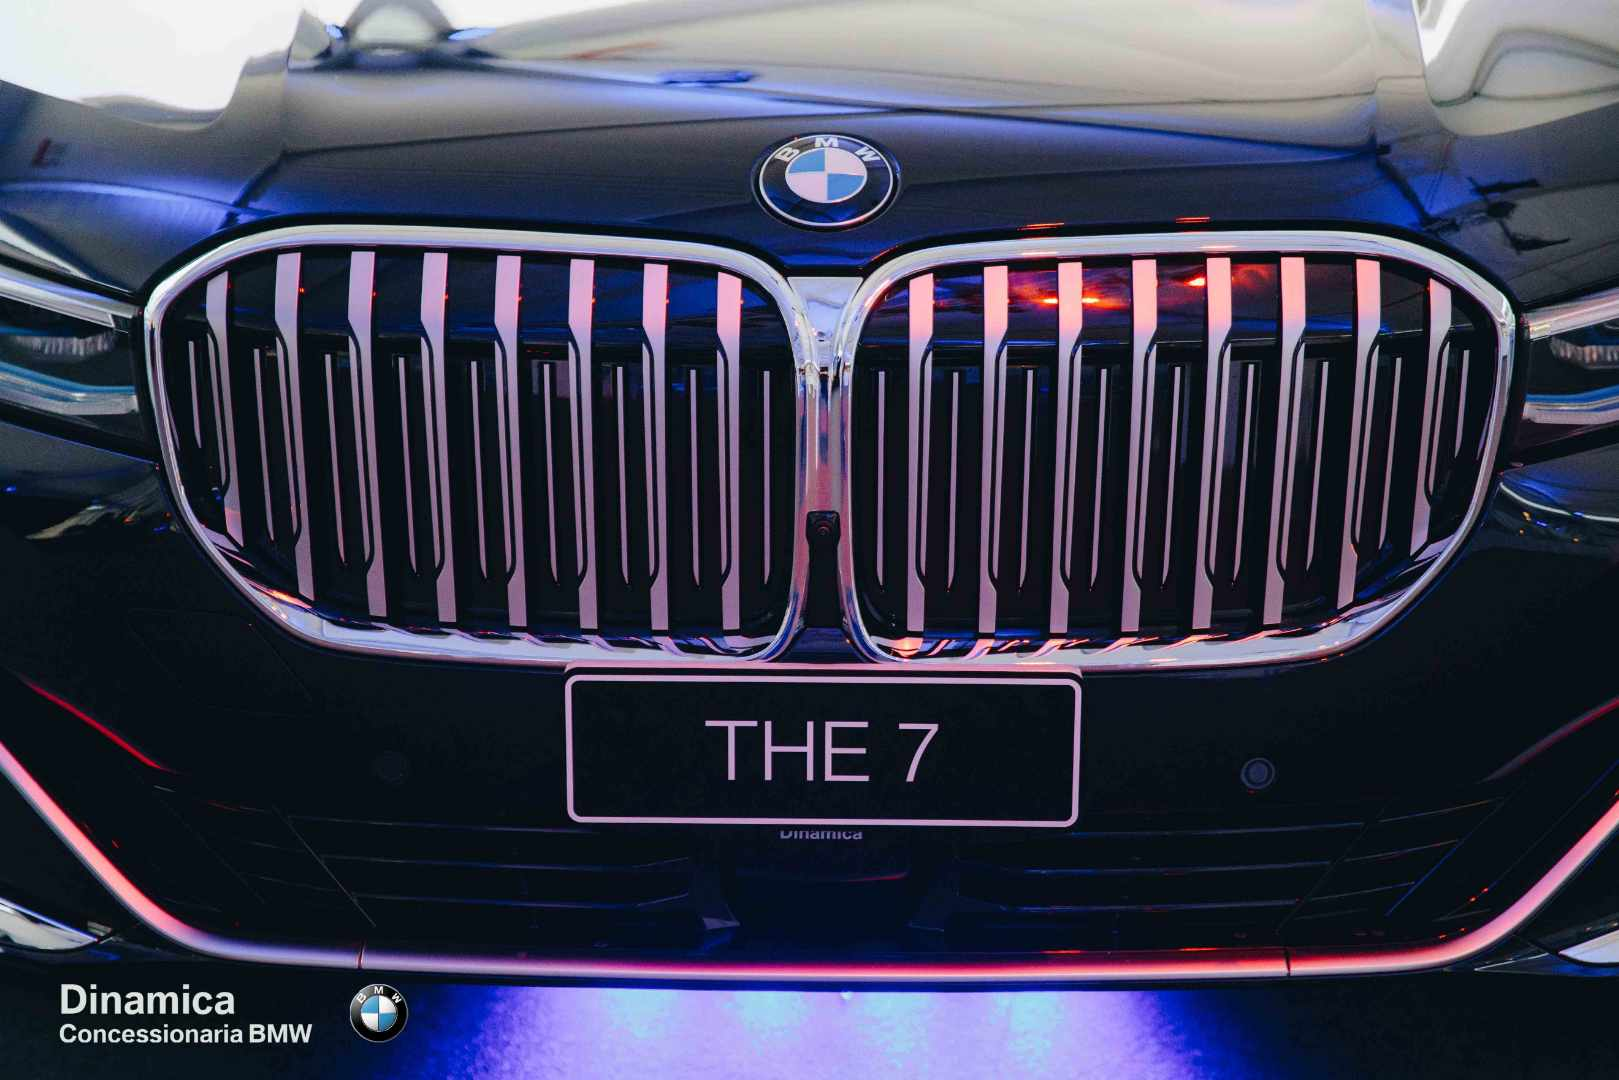 BMW Dinamica  - THE 7-18.jpg